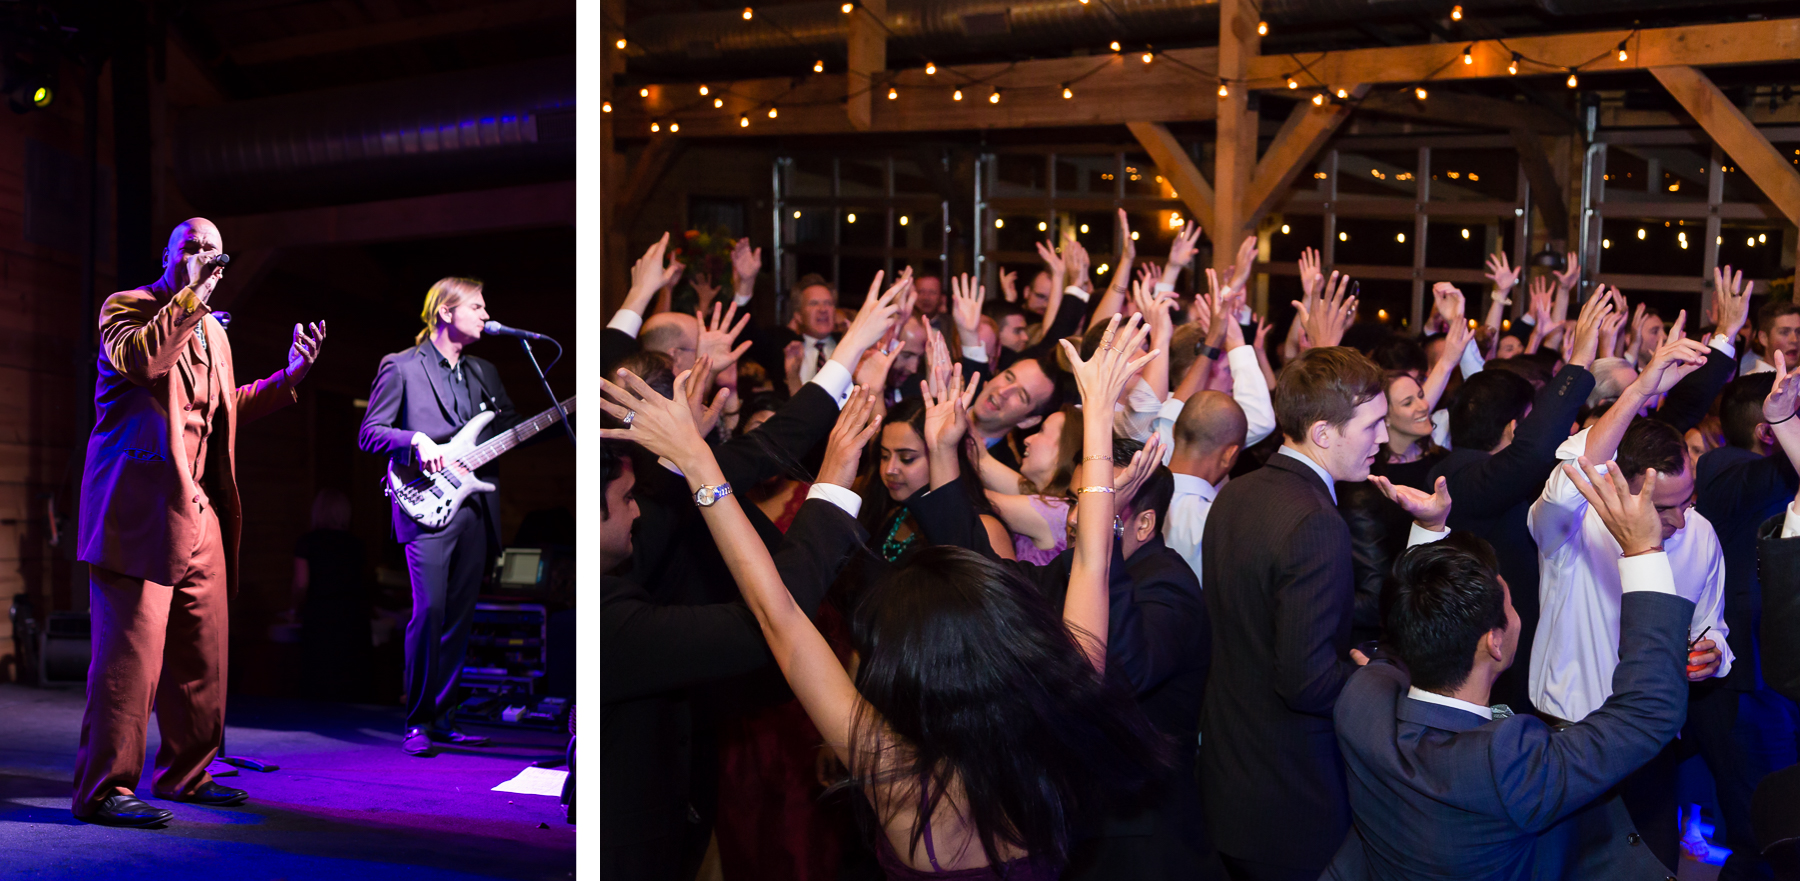 blind-date-wedding-band-texas.jpg